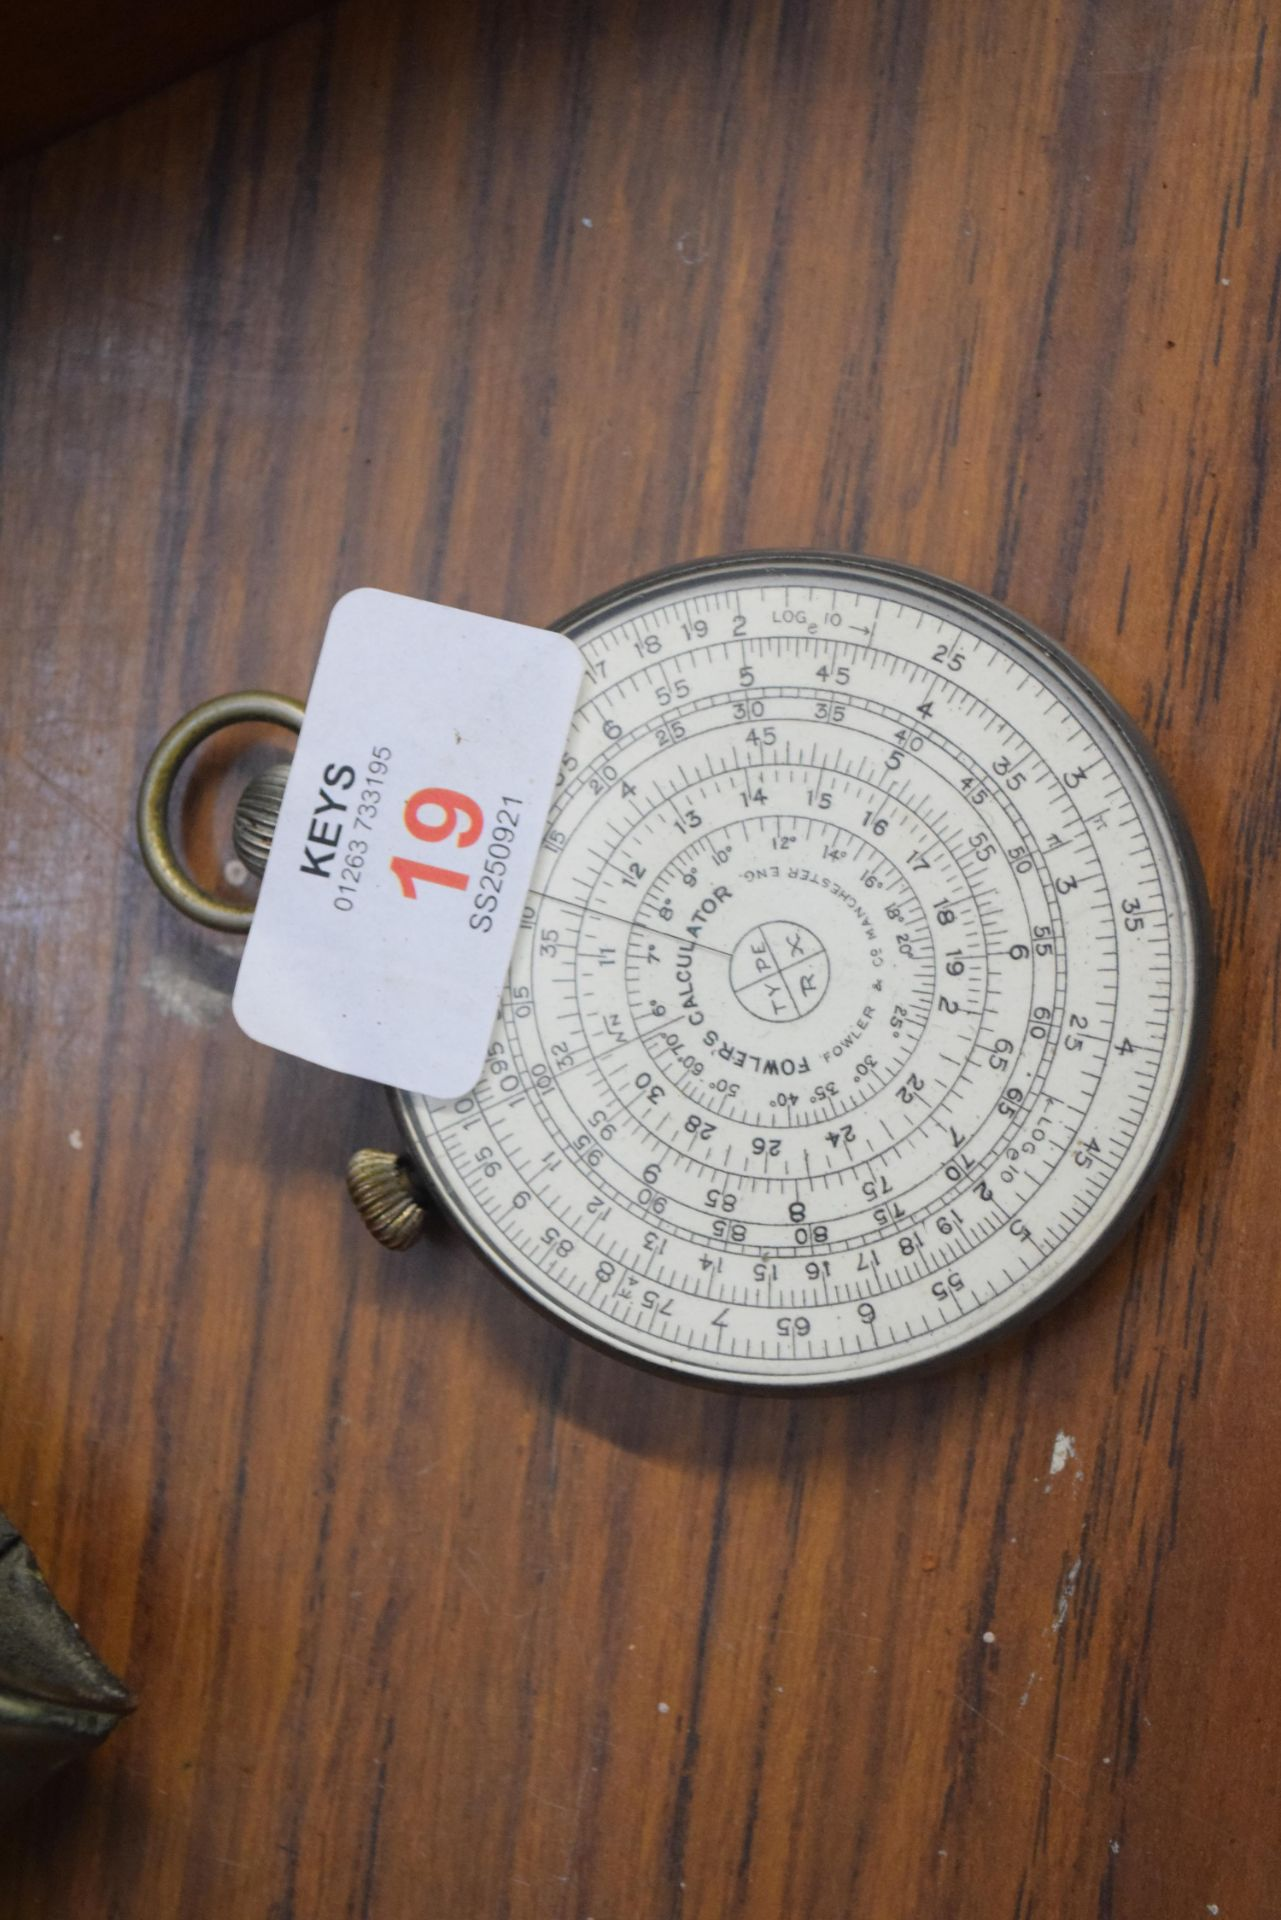 Mathematical interest - a Fowlers circular calculatore Type RX set in a base metal surround, 6.5cm